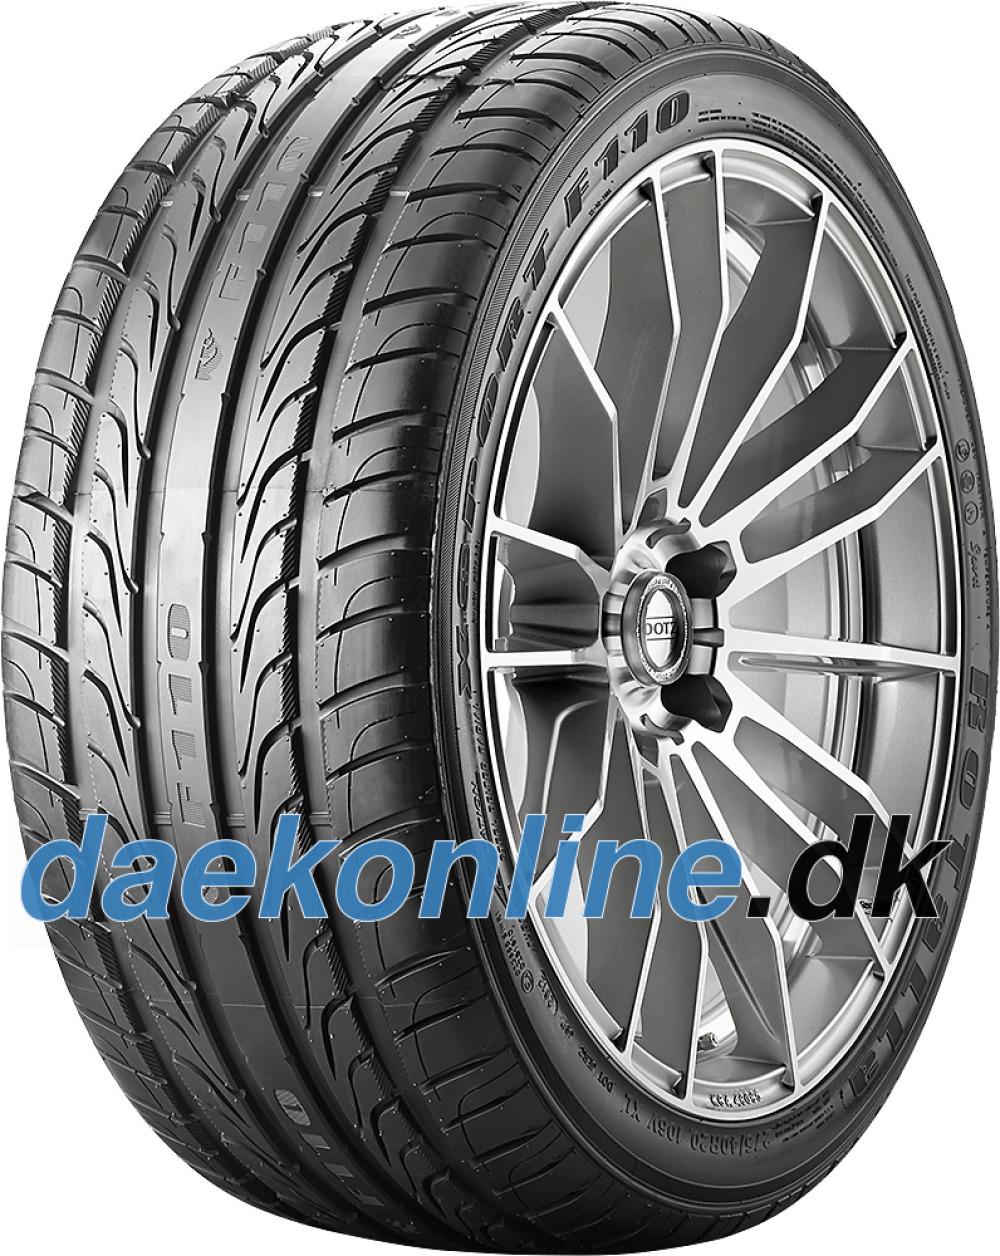 rotalla-xsport-f110-27555-r20-117v-xl-med-falgbeskyttelse-mfs